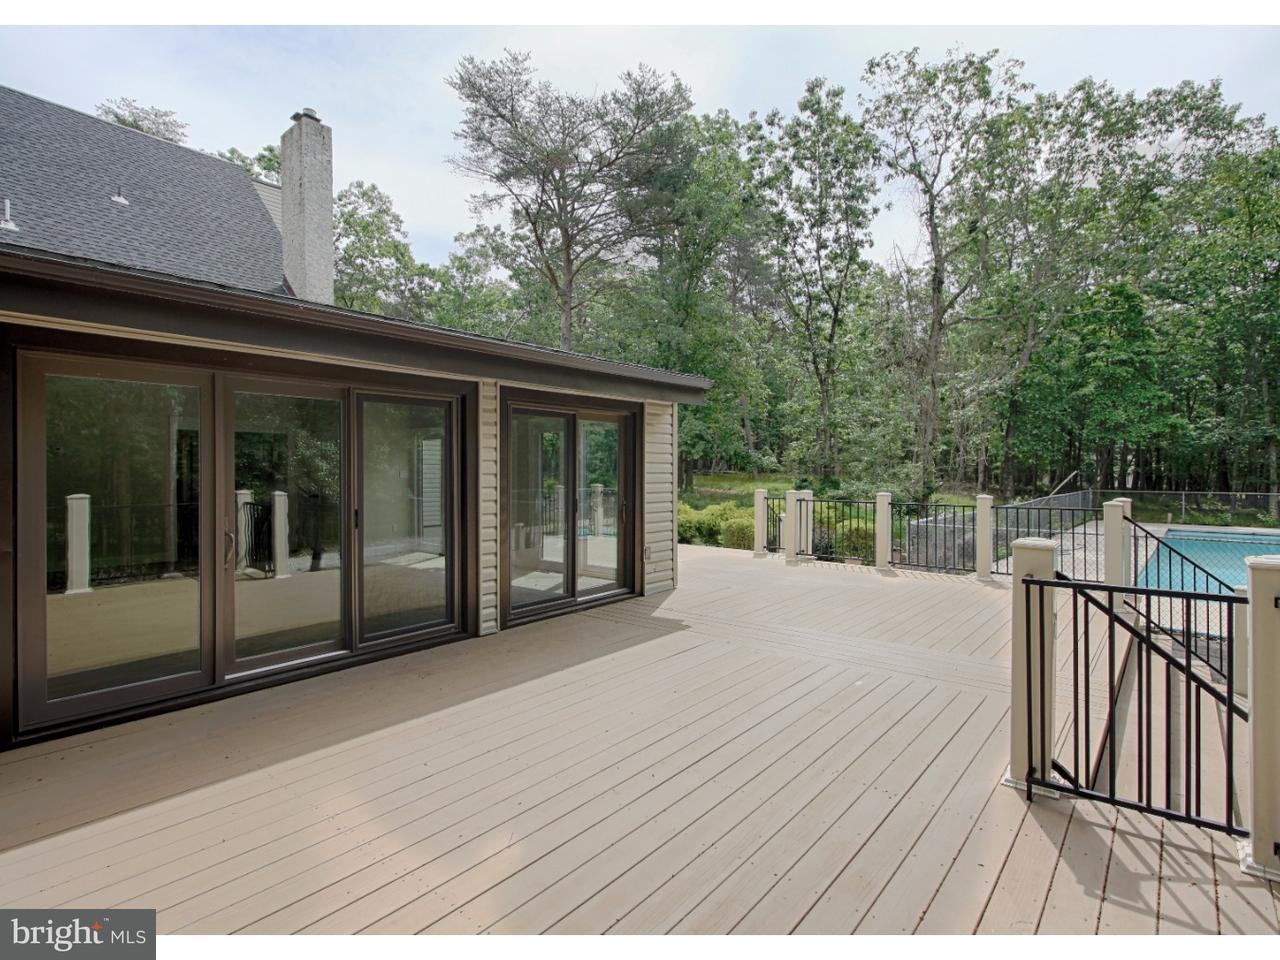 Additional photo for property listing at 658 TABERNACLE Road  Medford, Nueva Jersey 08055 Estados Unidos